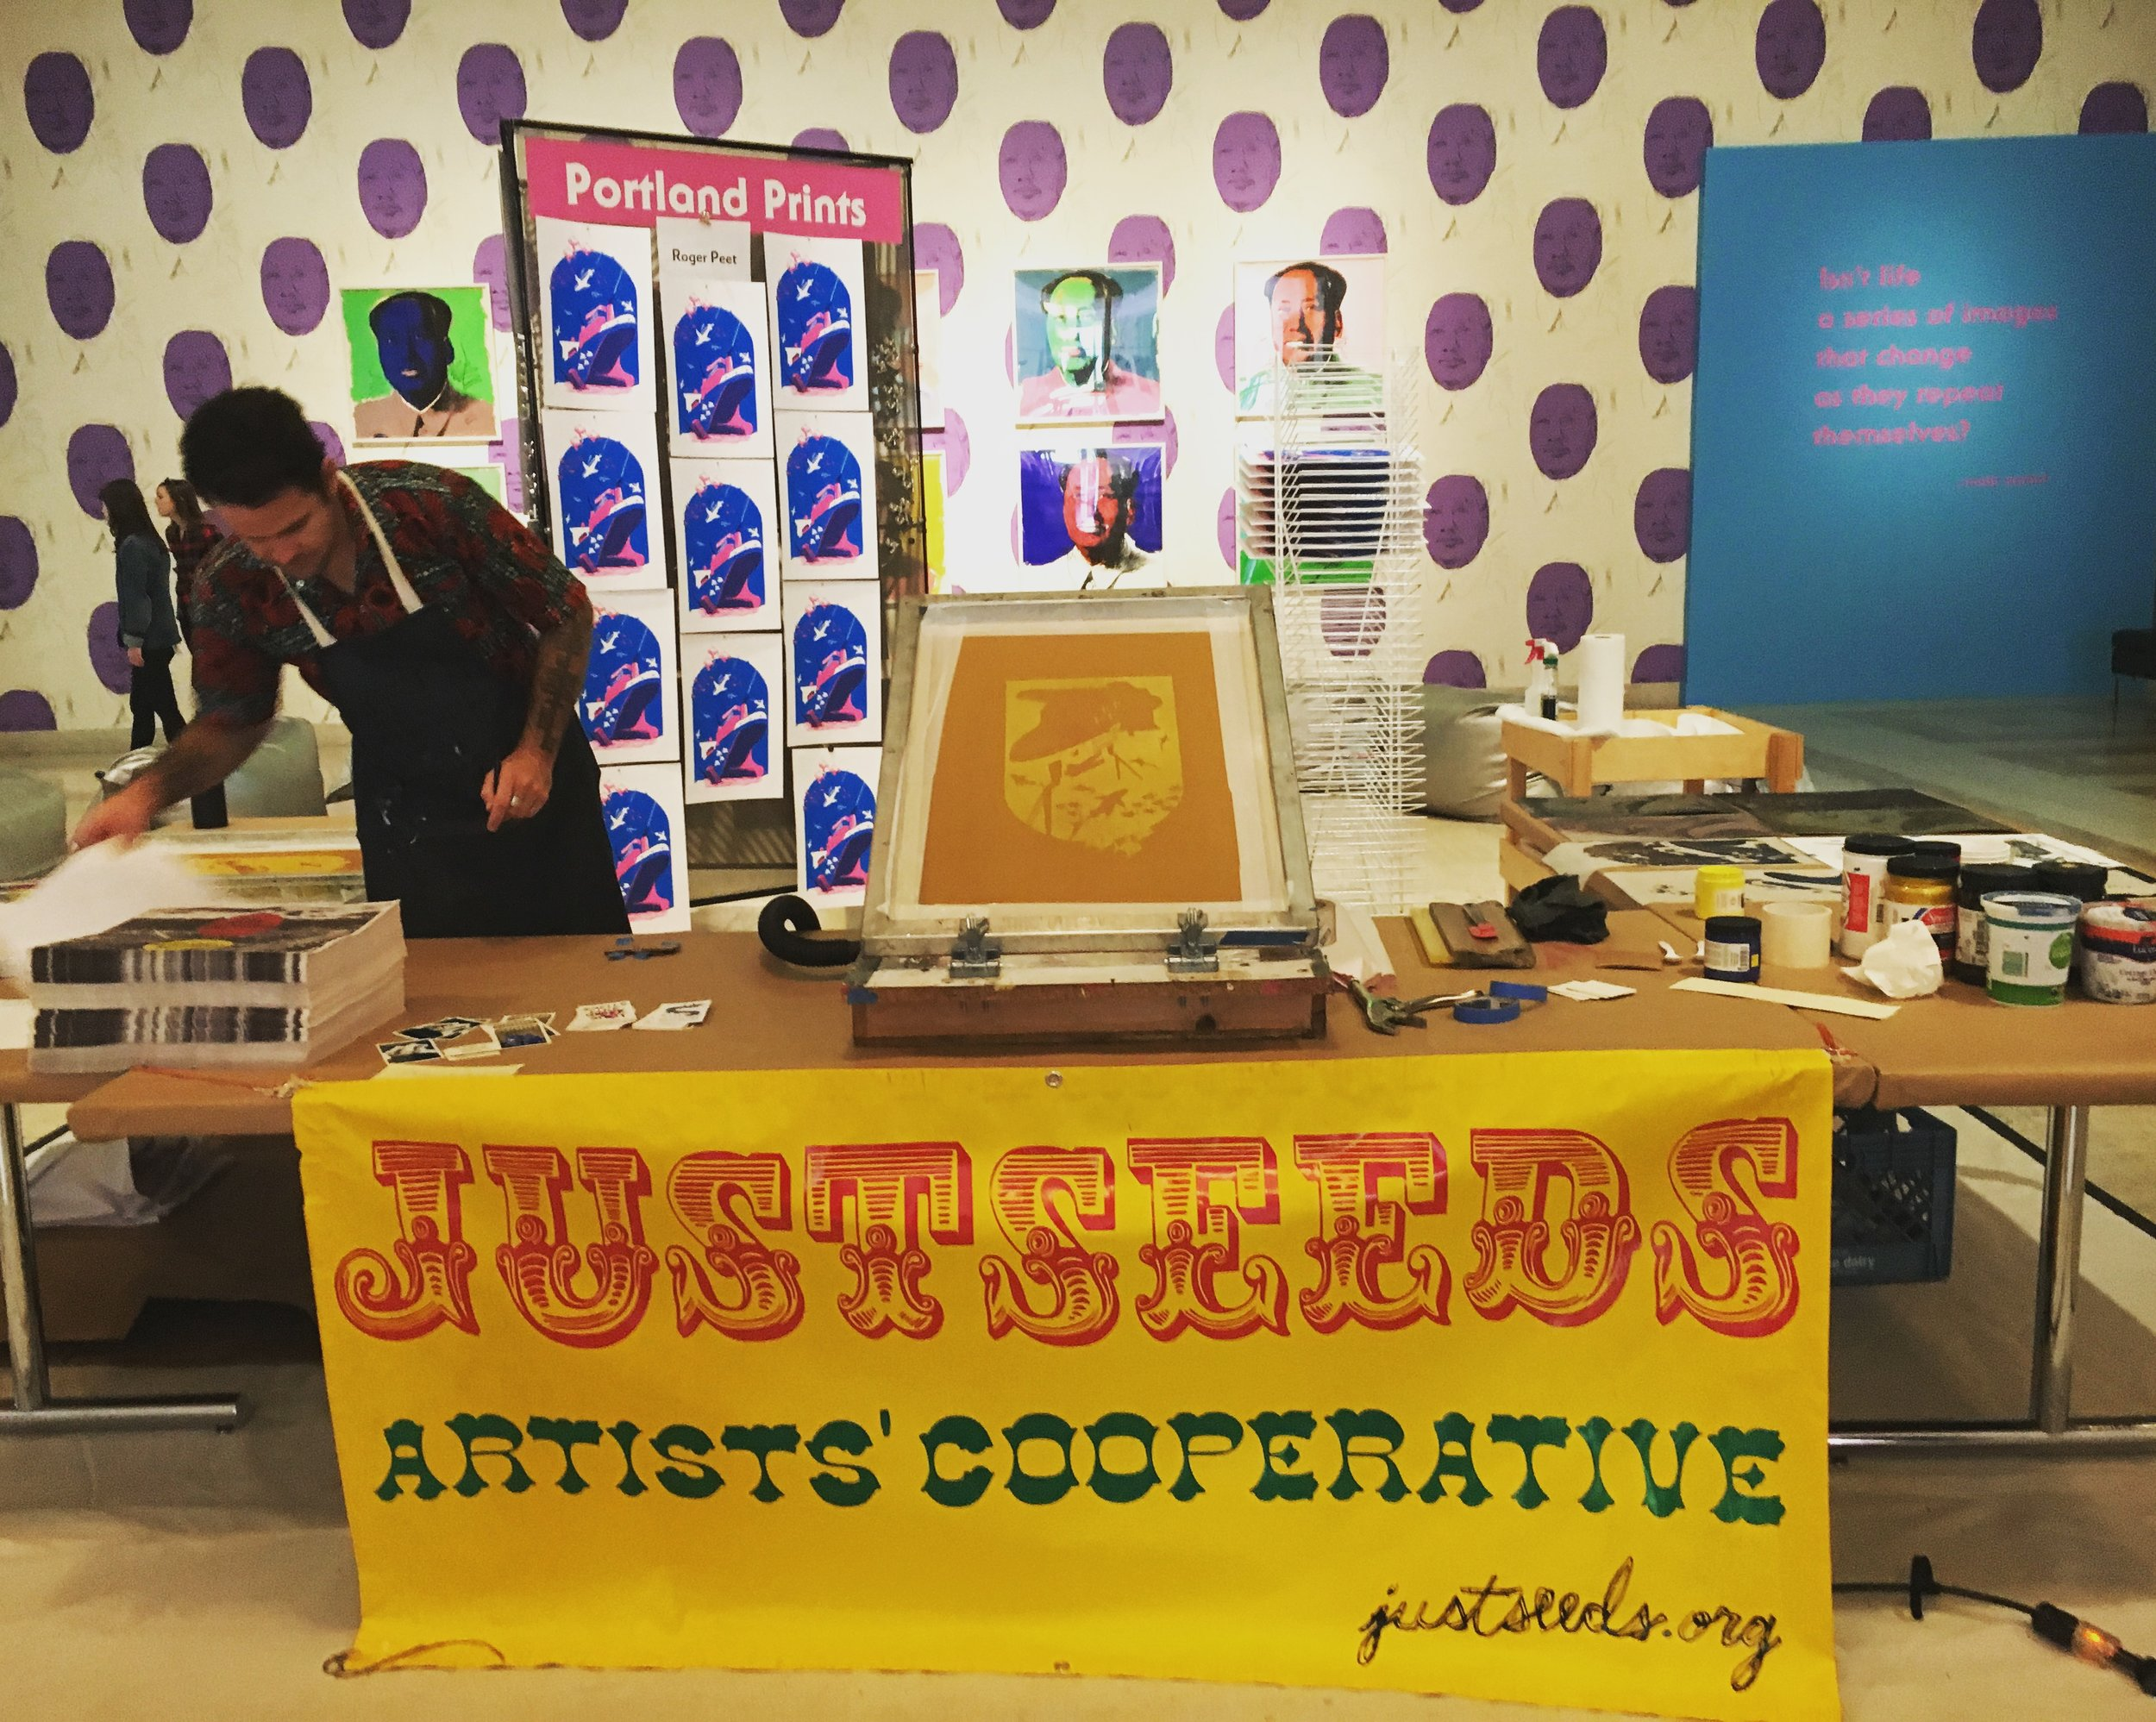 JustSeeds_Artists-Cooperative_Portland-Art-Museum.jpg